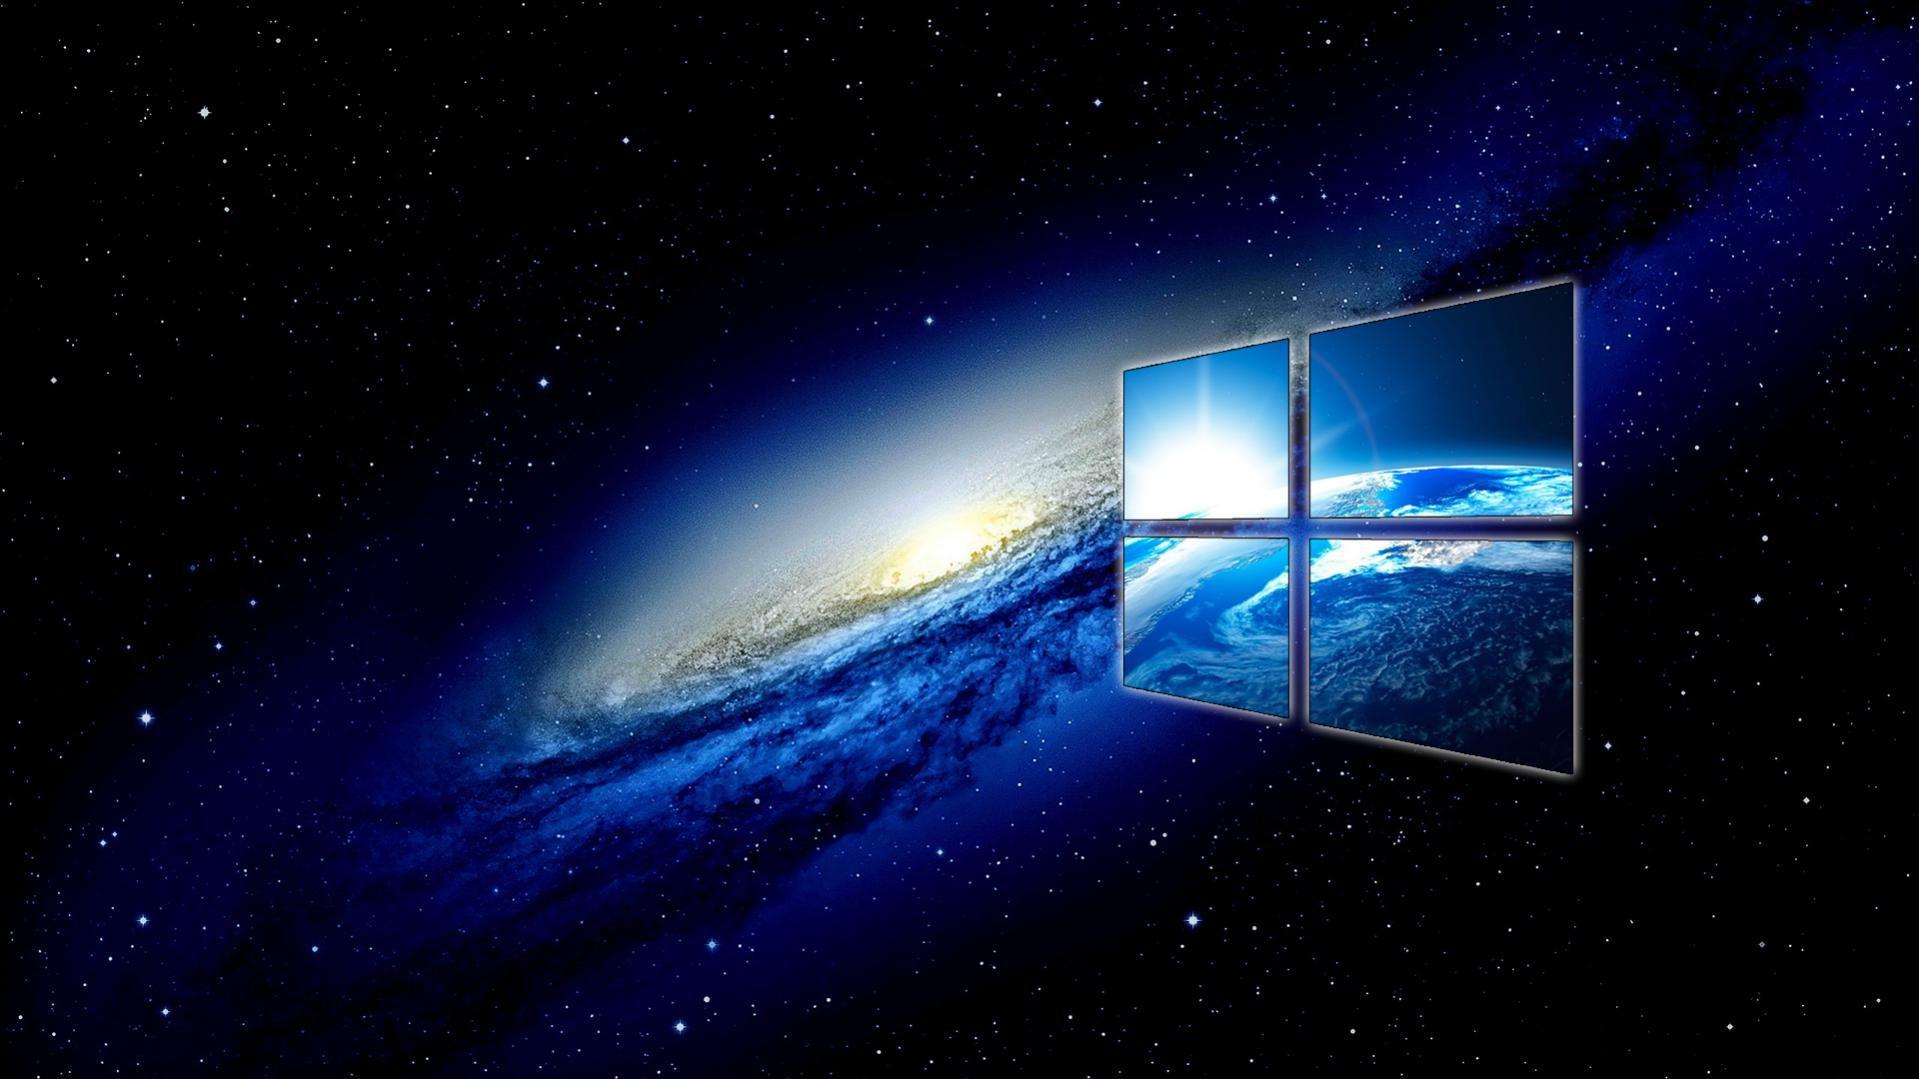 Windows 10 Wallpaper for Desktop Background in 2019 Desktop 1919x1079